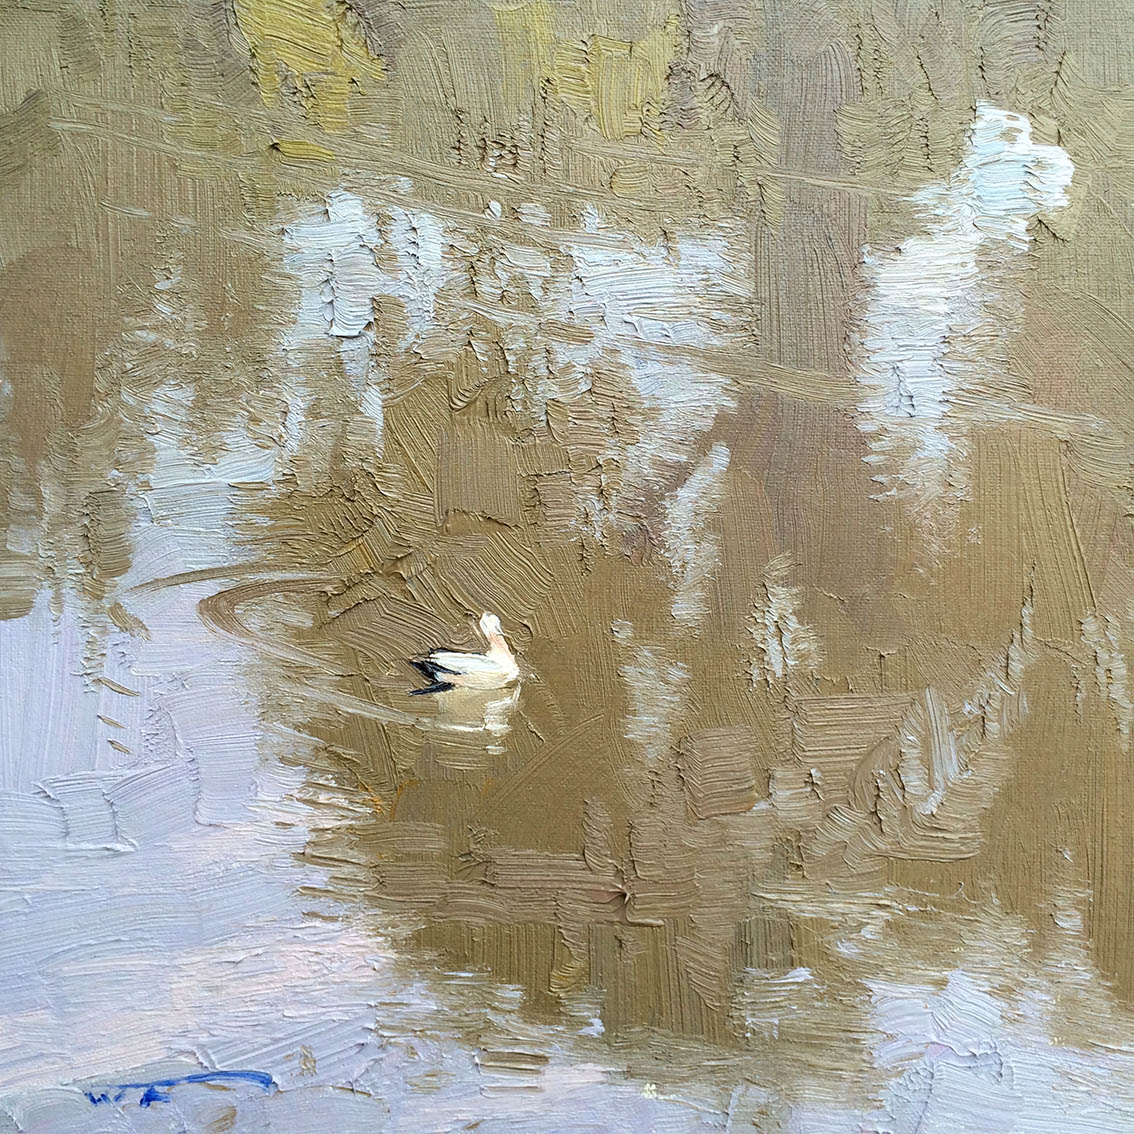 Pelican.-Darling-River-Bourke.-30x30cm-copy.jpg